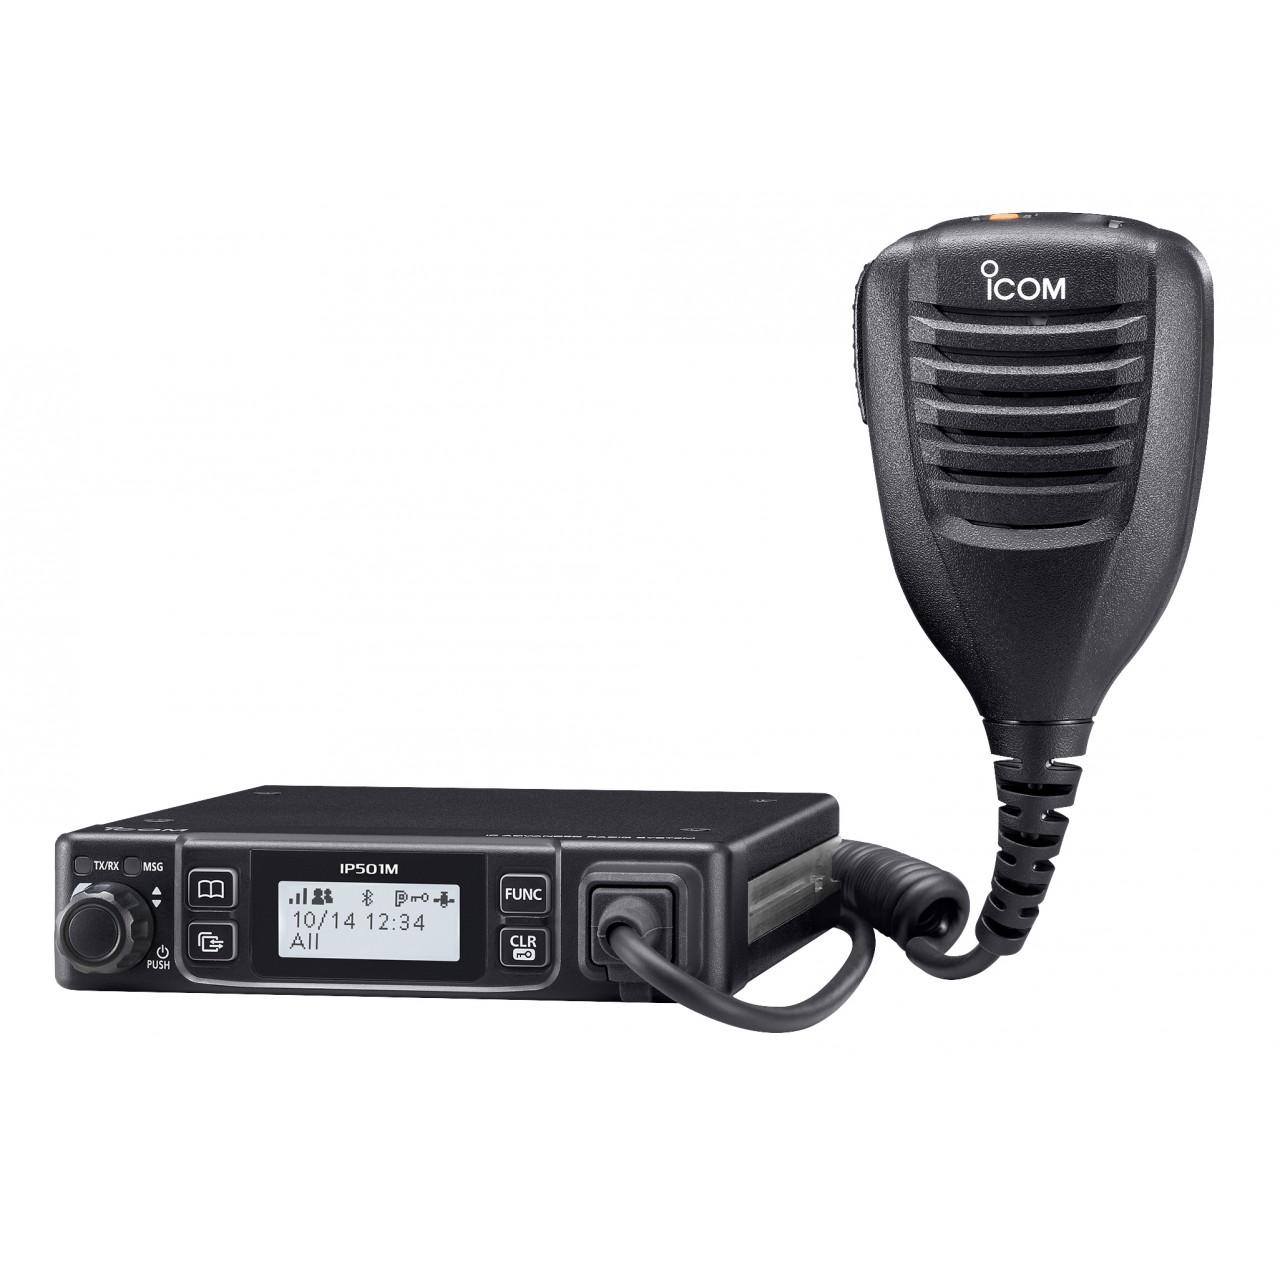 IP501M Mobiles - ICOM